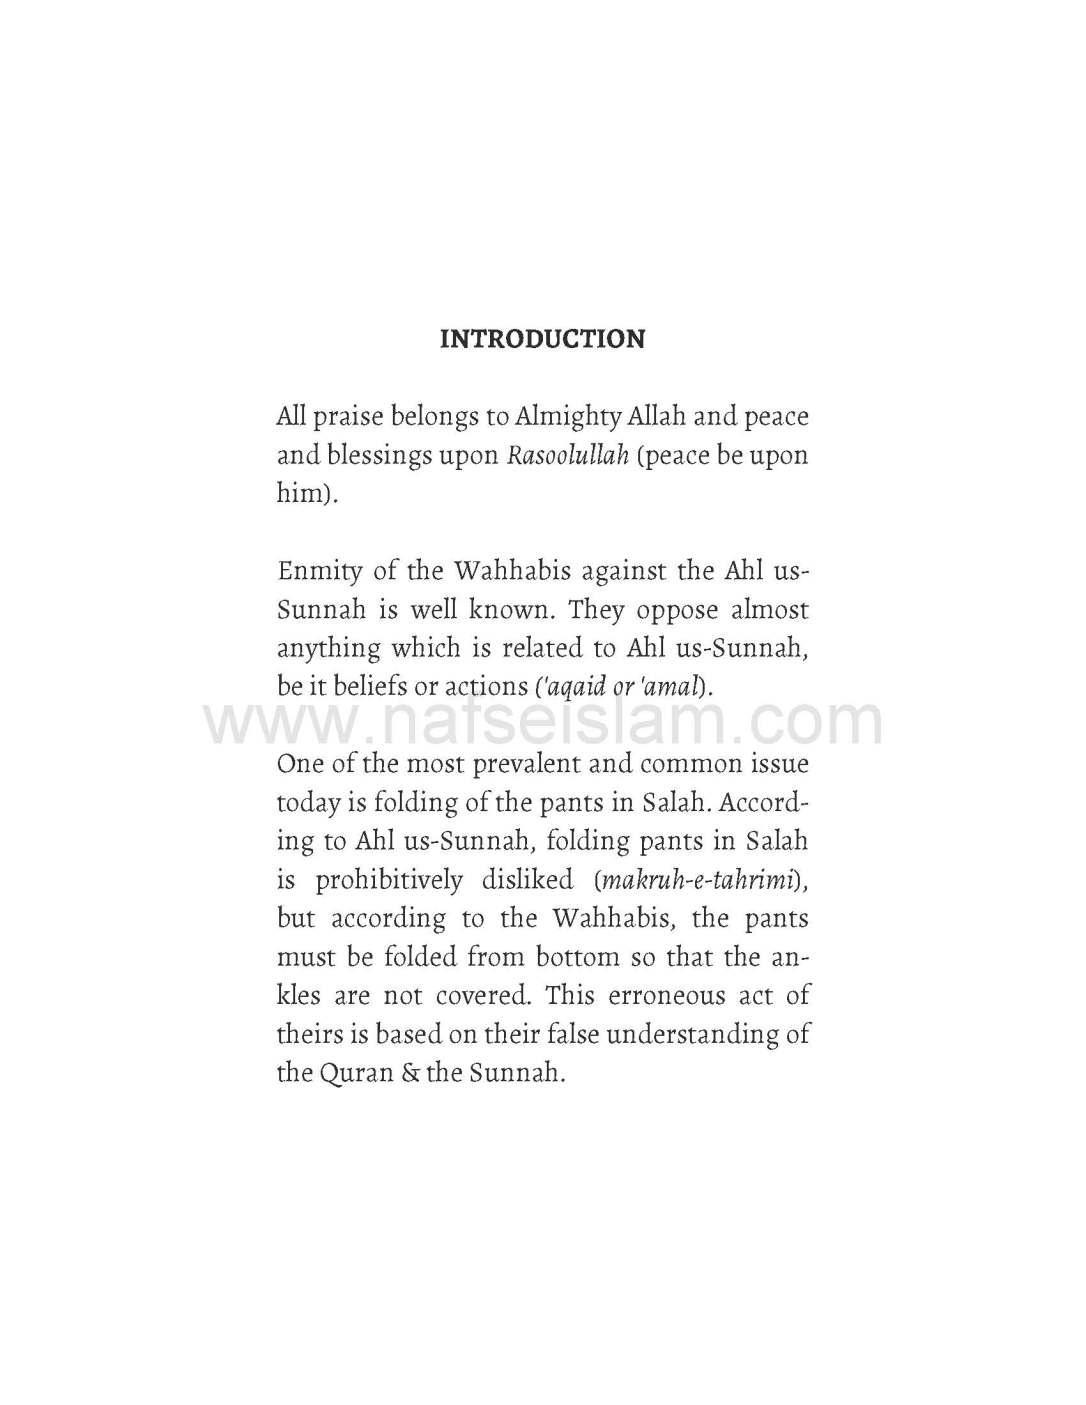 Islamic Ruling On Folding Pants In Salah_Page_02